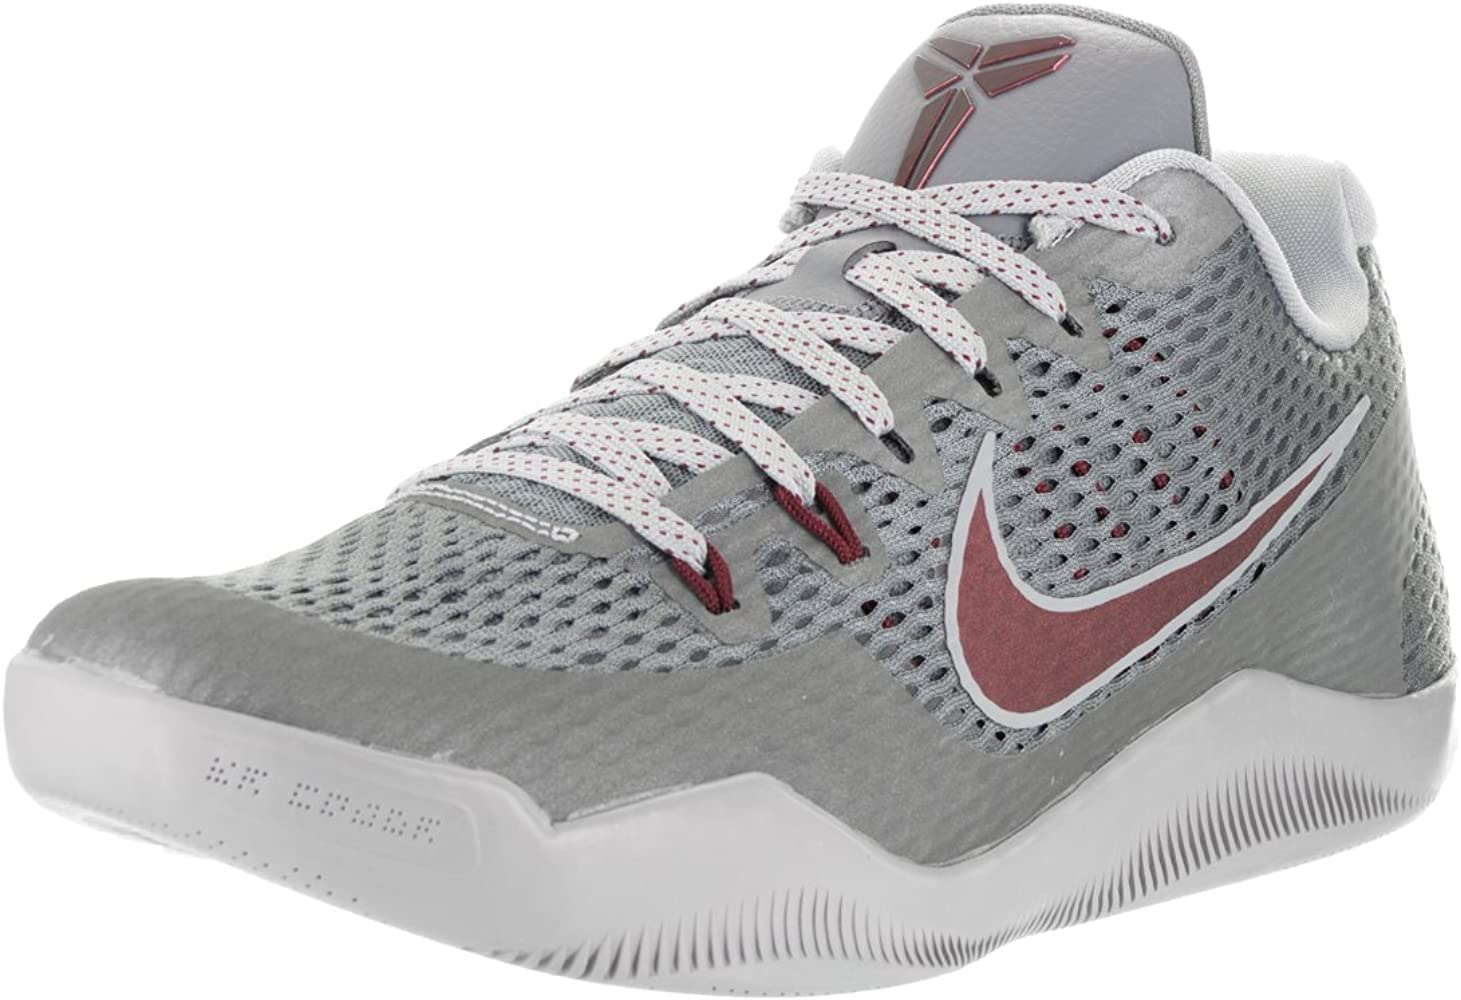 Zapatillas de baloncesto Nike Mens Kobe XI Cool Gray / Team Red ...